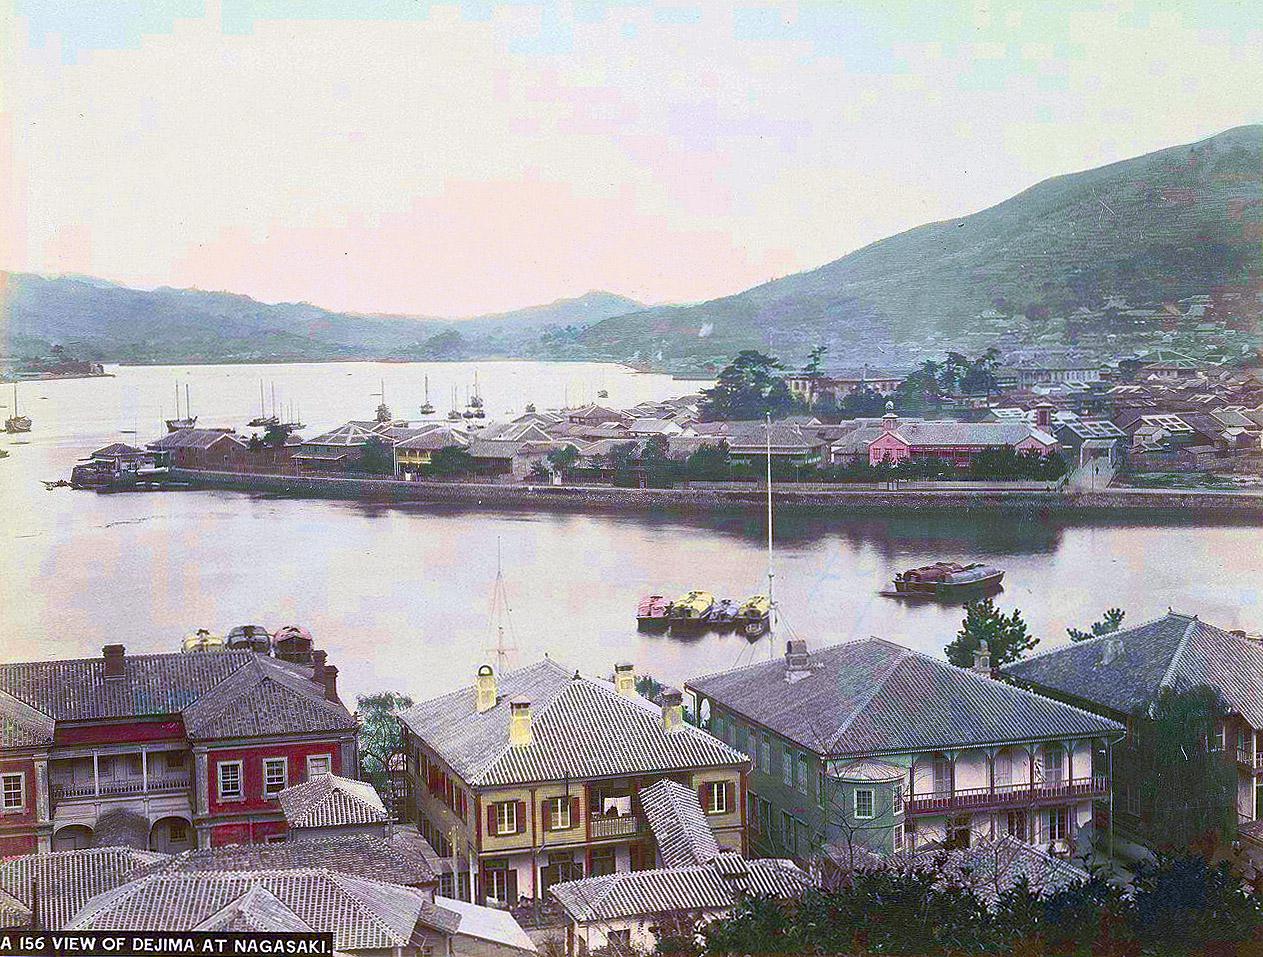 1870 View of Dejima at Nagasaki.jpg